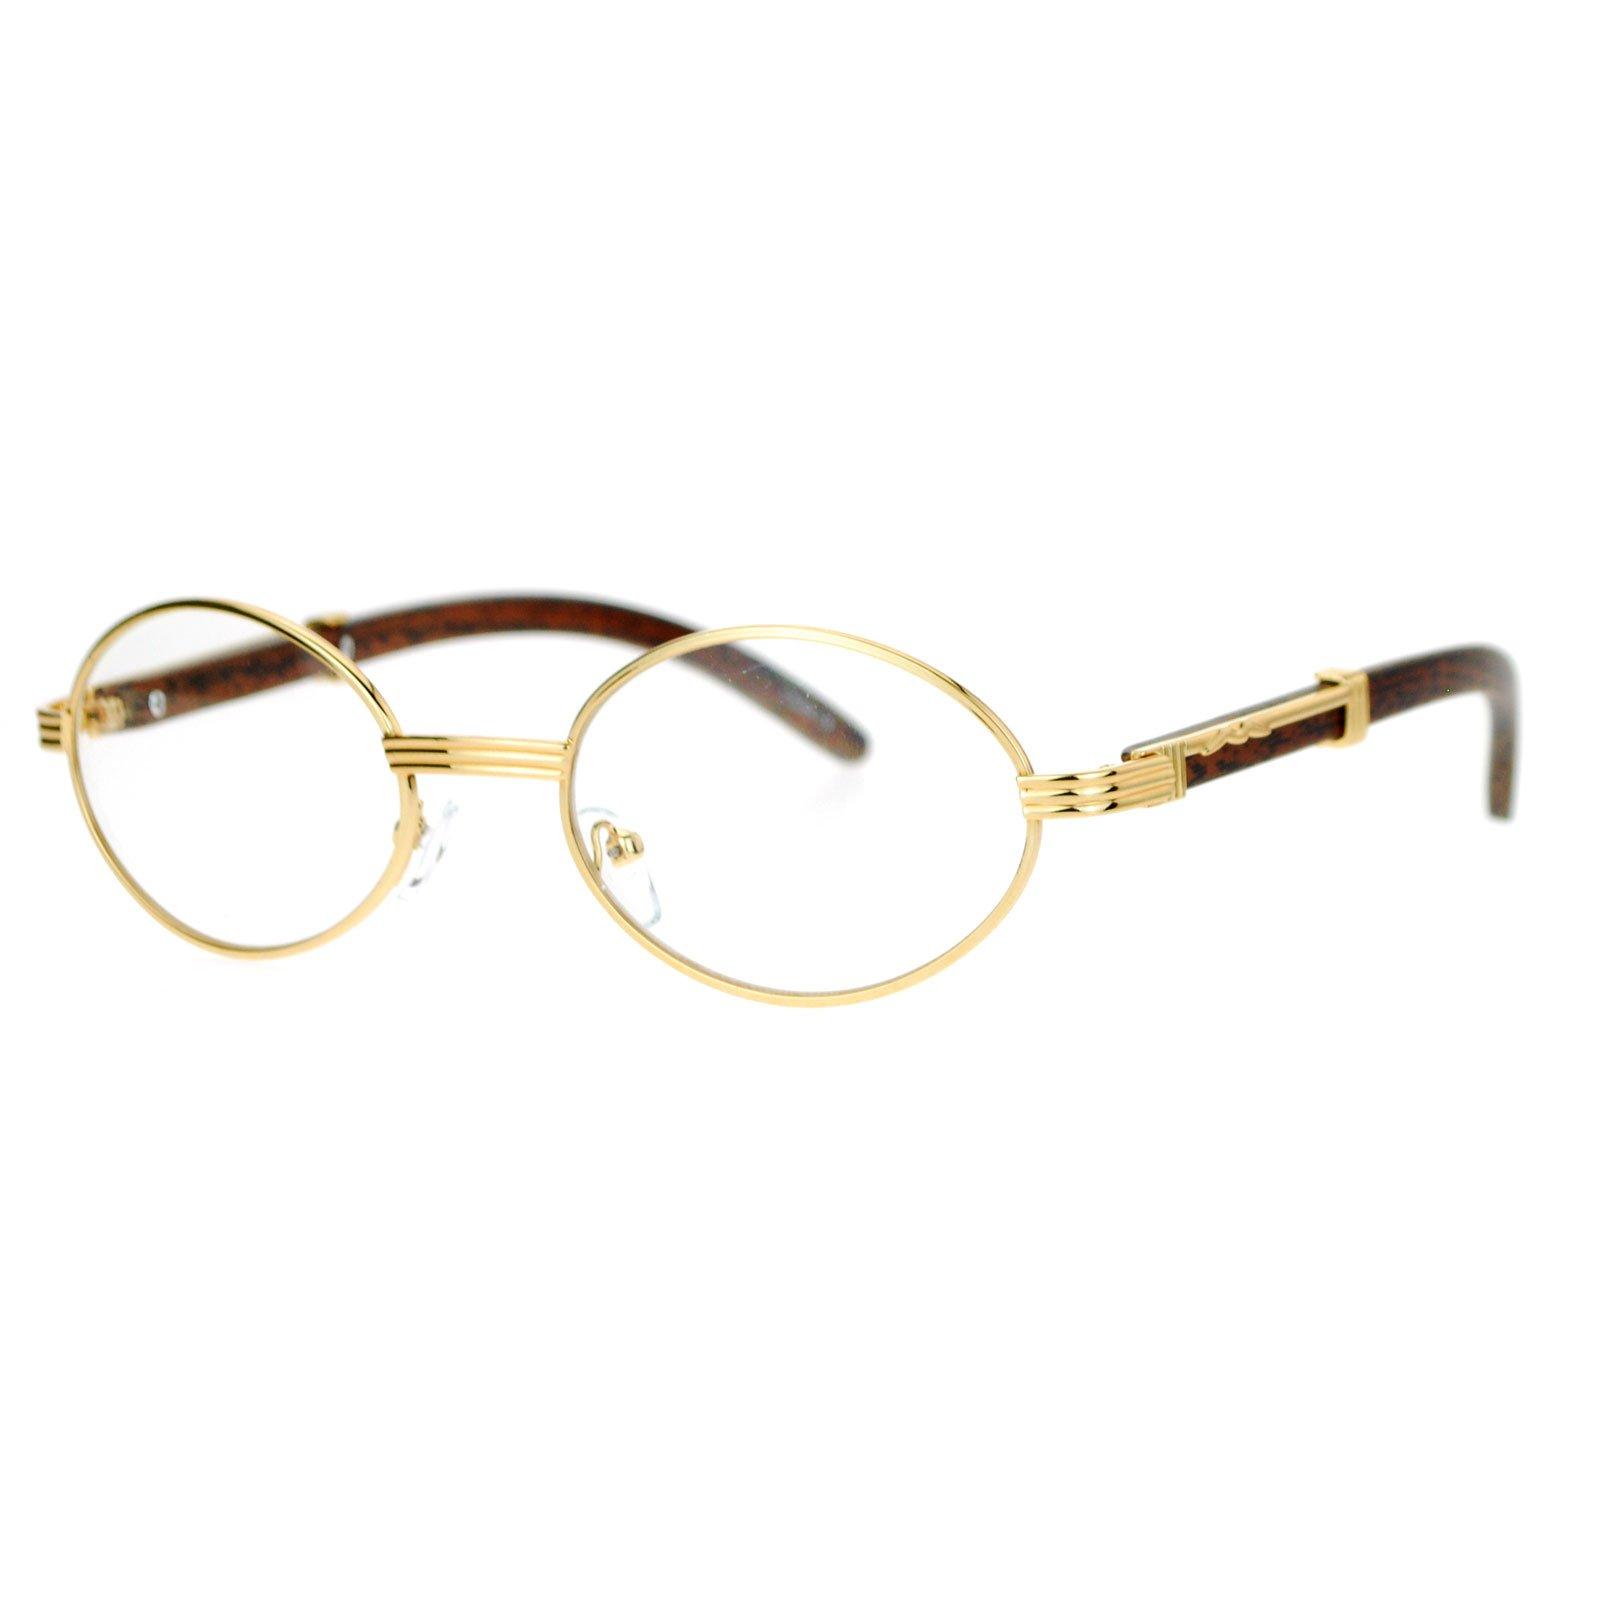 SA106 Art Nouveau Vintage Style Oval Metal Frame Eye Glasses Yellow Gold by SA106